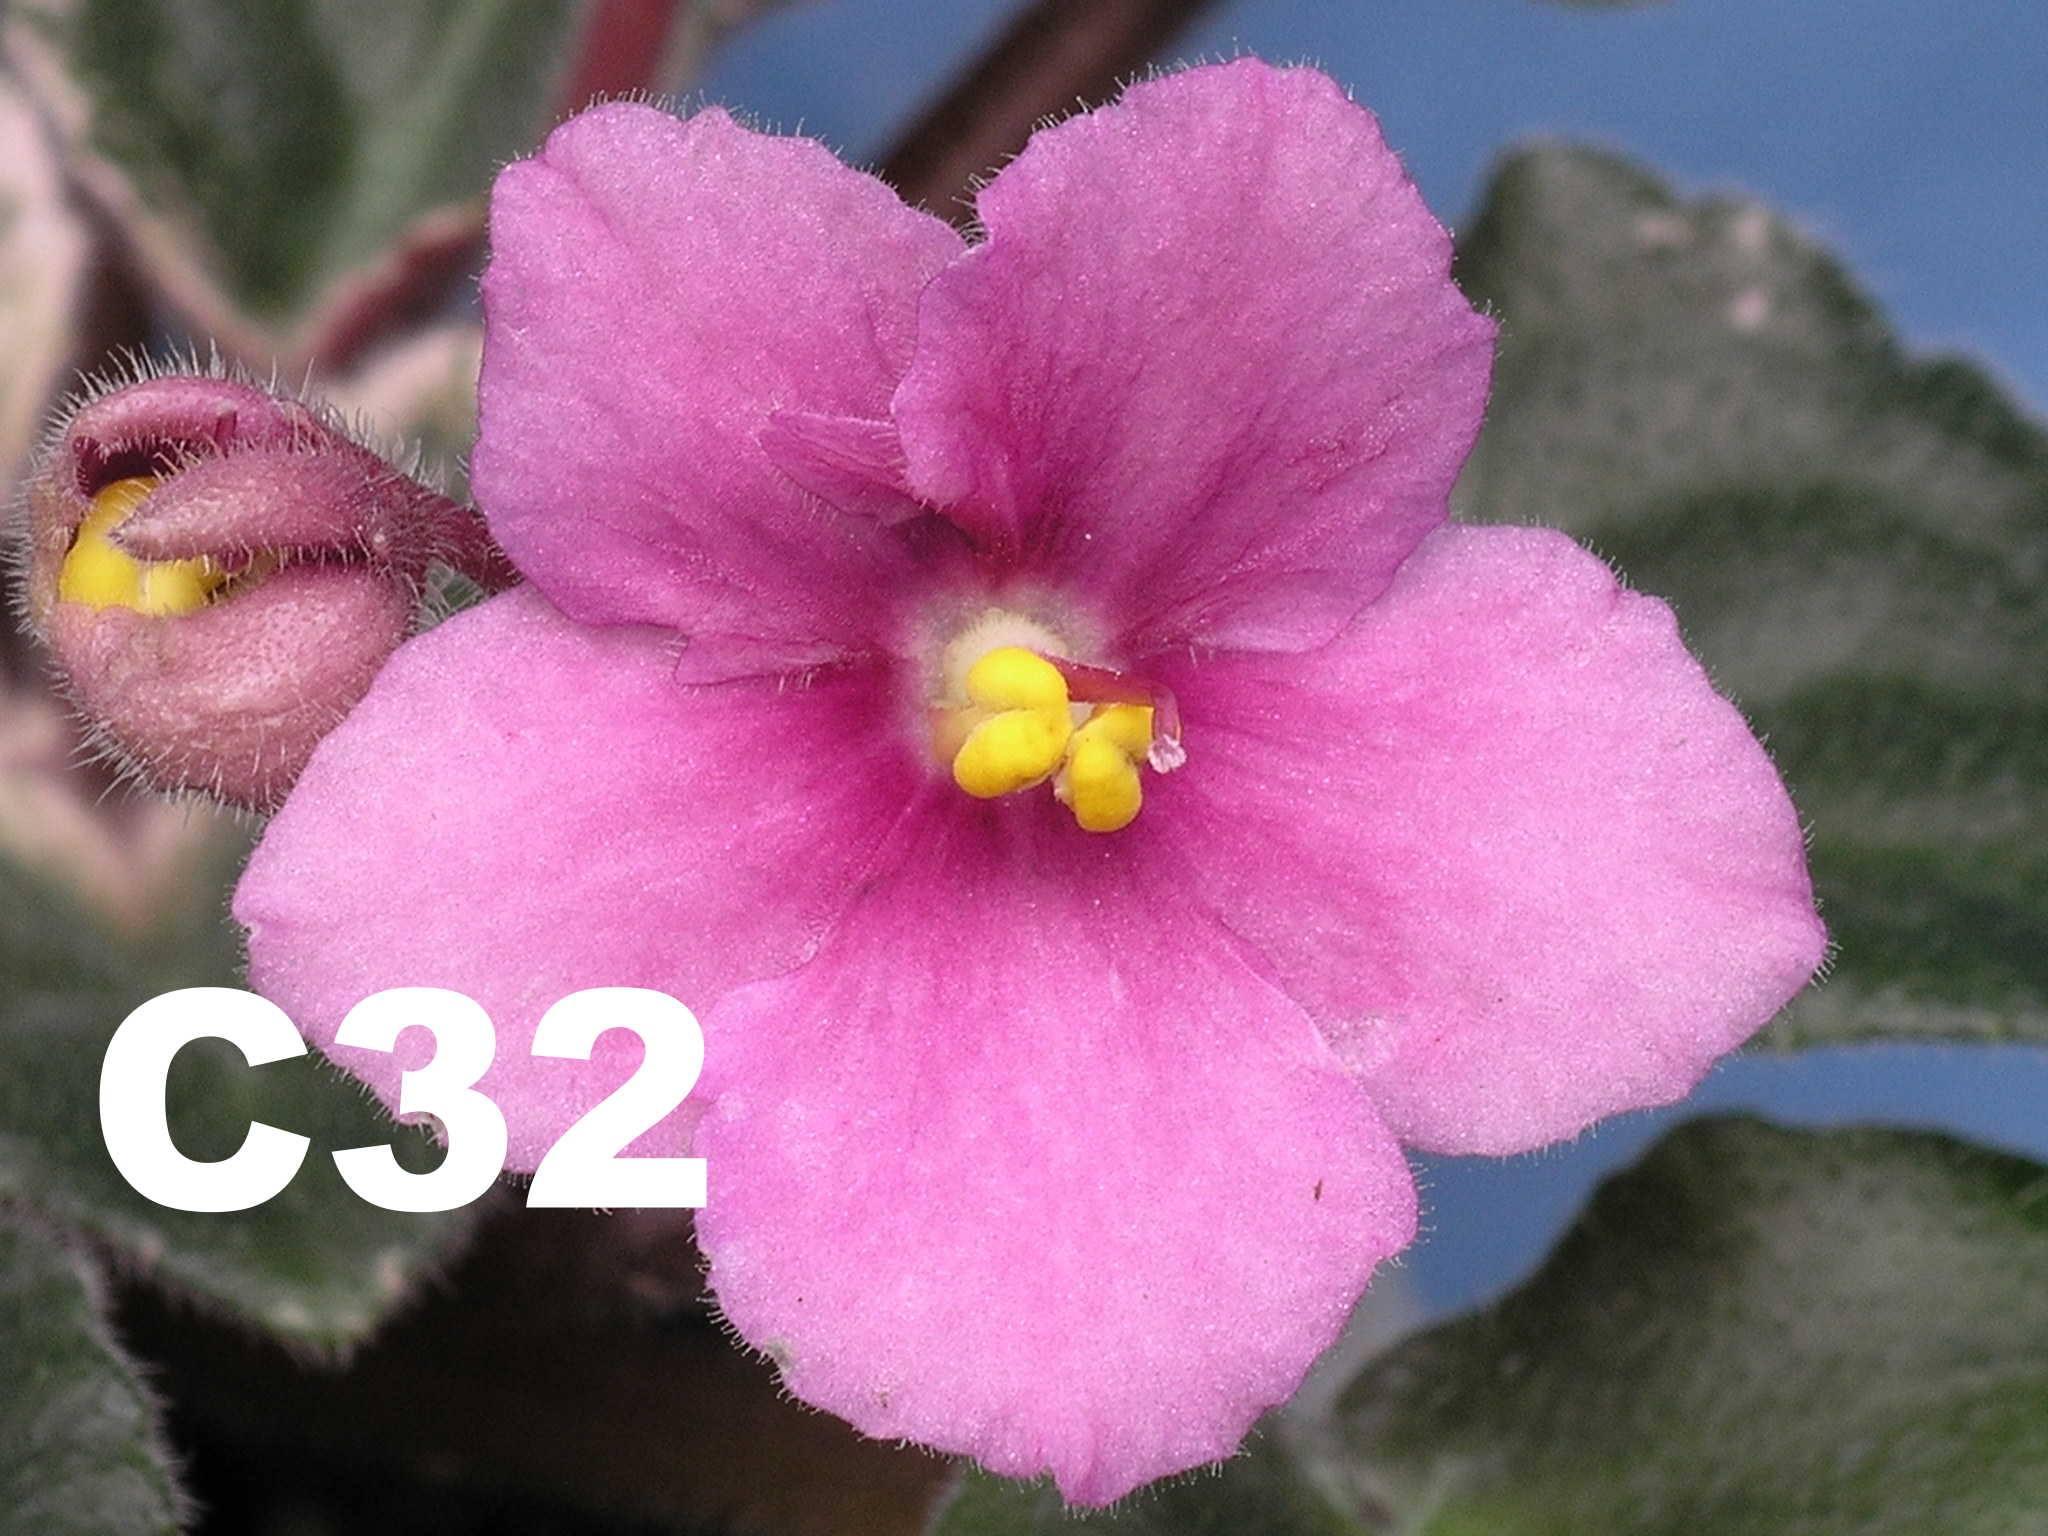 非洲紫羅蘭名錄 | African Violets Catalogue - C系列 C32